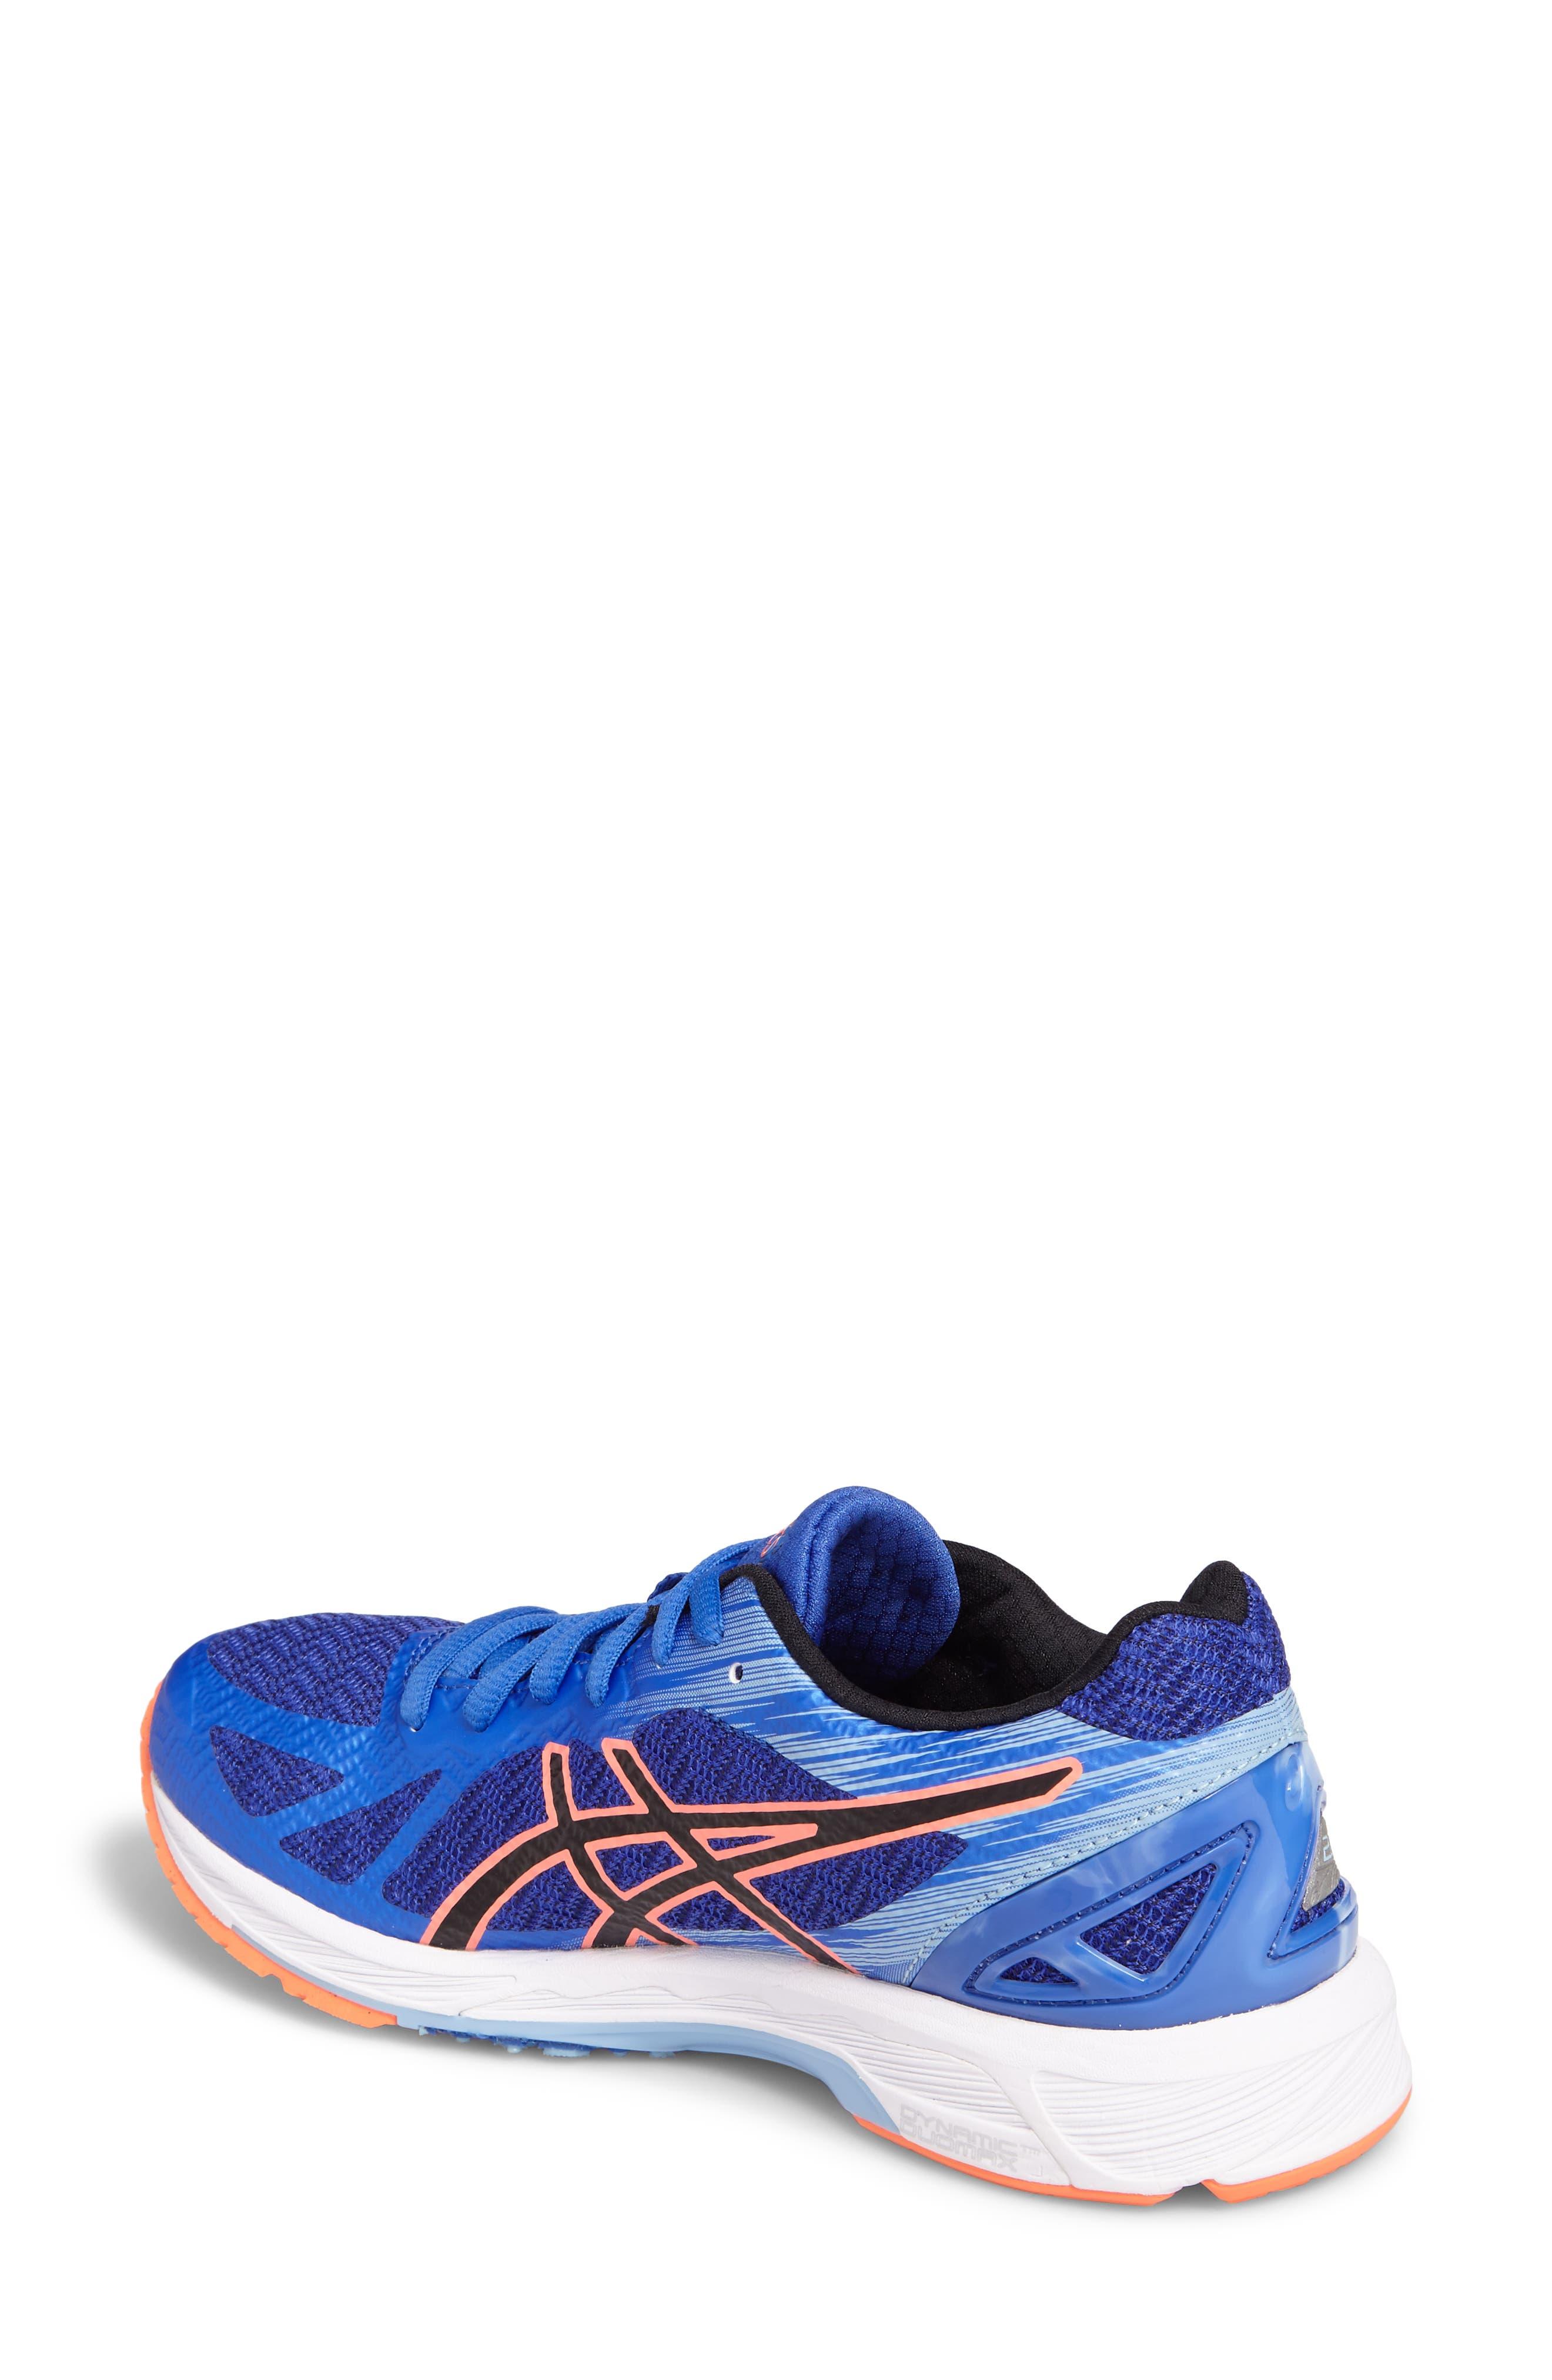 GEL-DS Trainer 22 Running Shoe,                             Alternate thumbnail 2, color,                             Blue Purple/ Black/ Coral